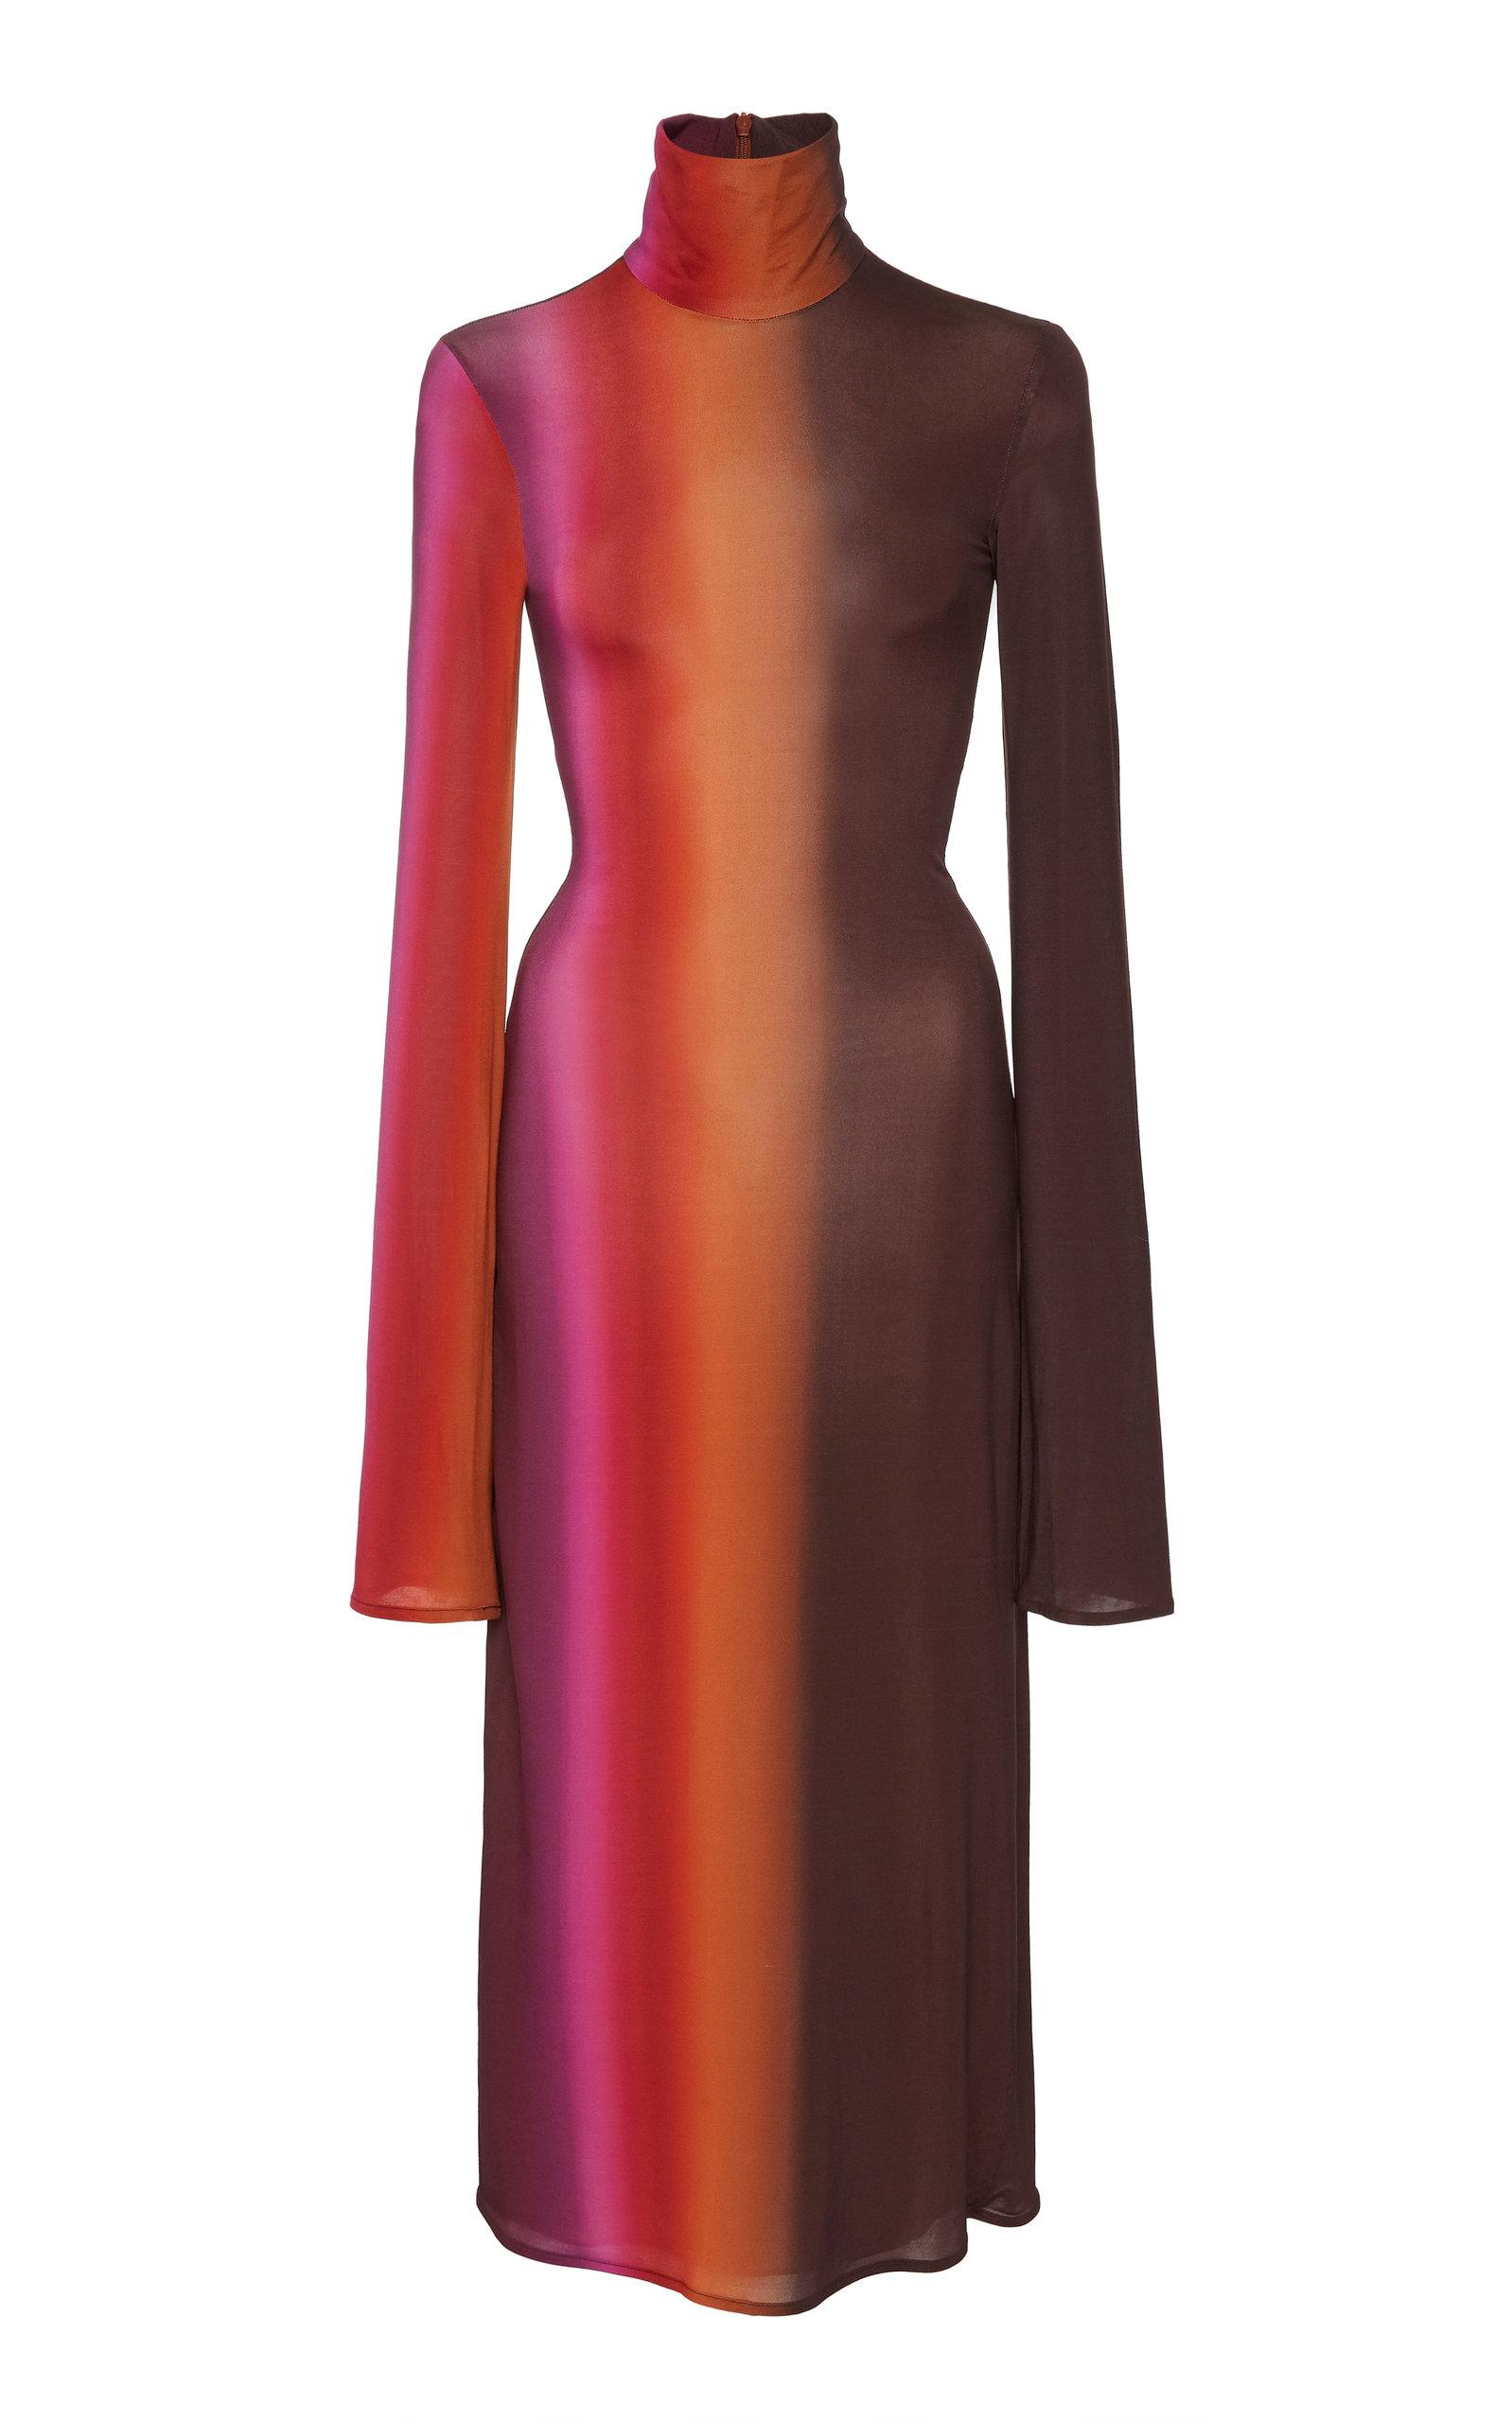 50d3f19959ad Women's Dresses | Moda Operandi | Moda Operandi